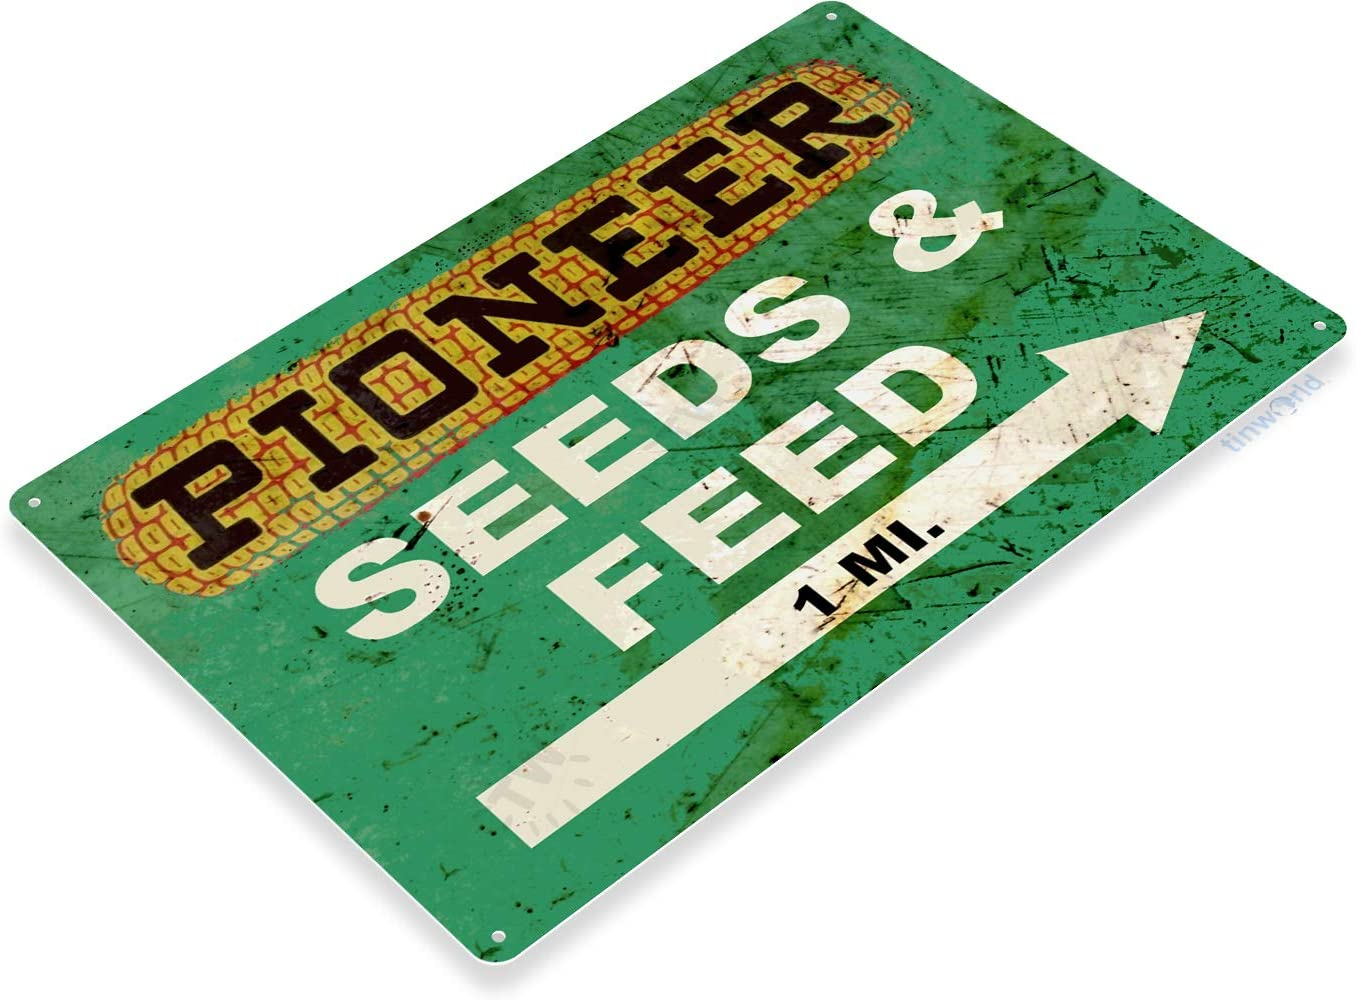 TIN SIGN B580 Pioneer Seed and Feed Farm Seeds Feed Rustic Metal Decor